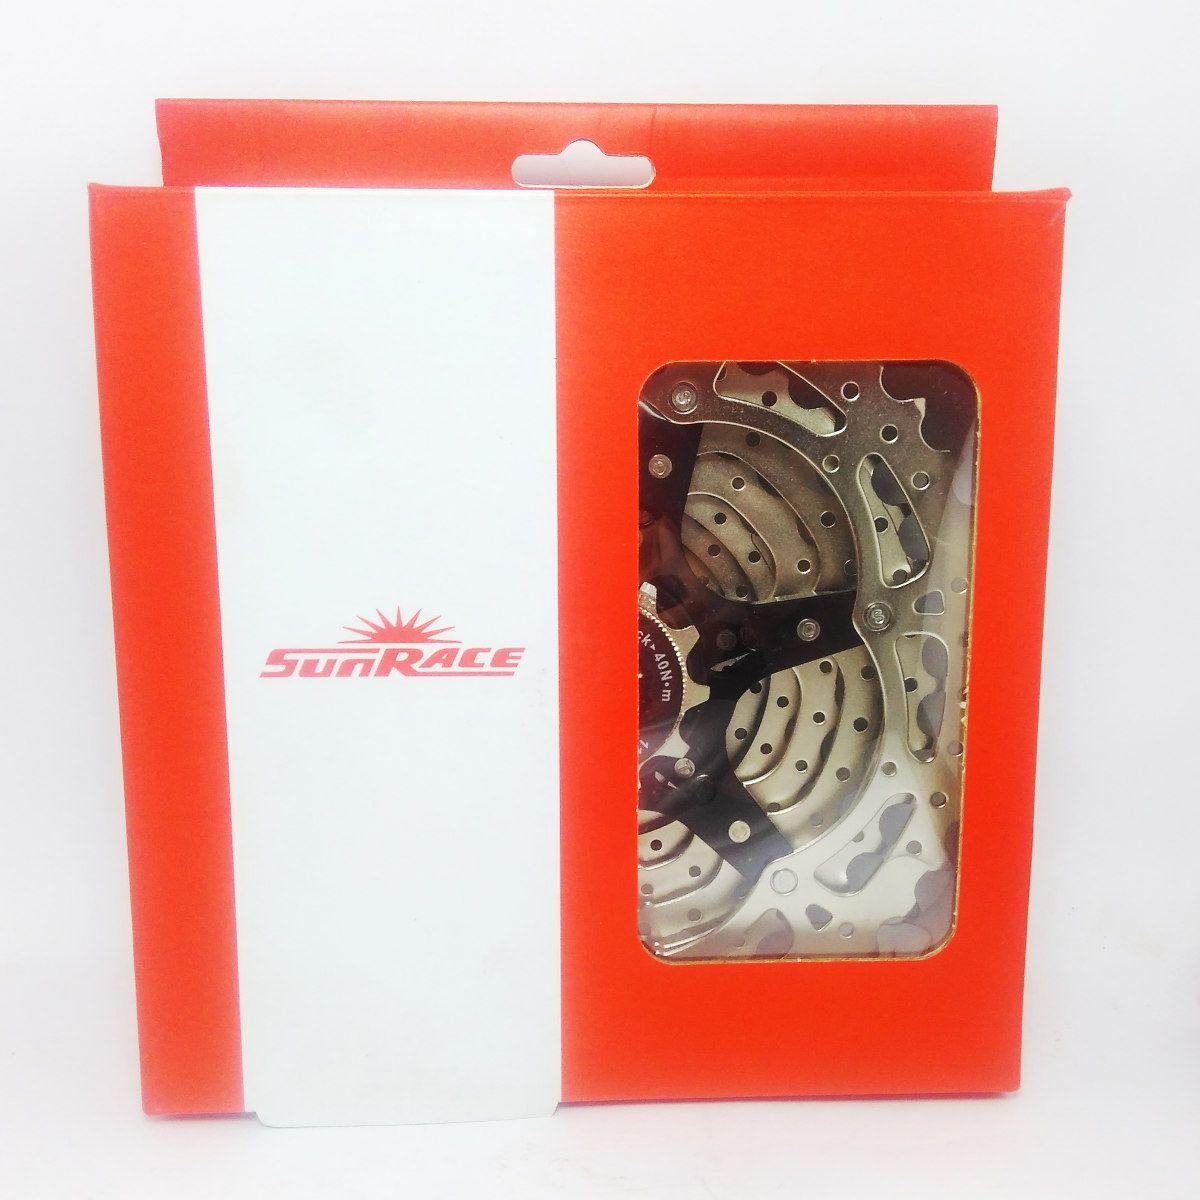 Cassete SunRace  MS3 11x42 10 velocidades